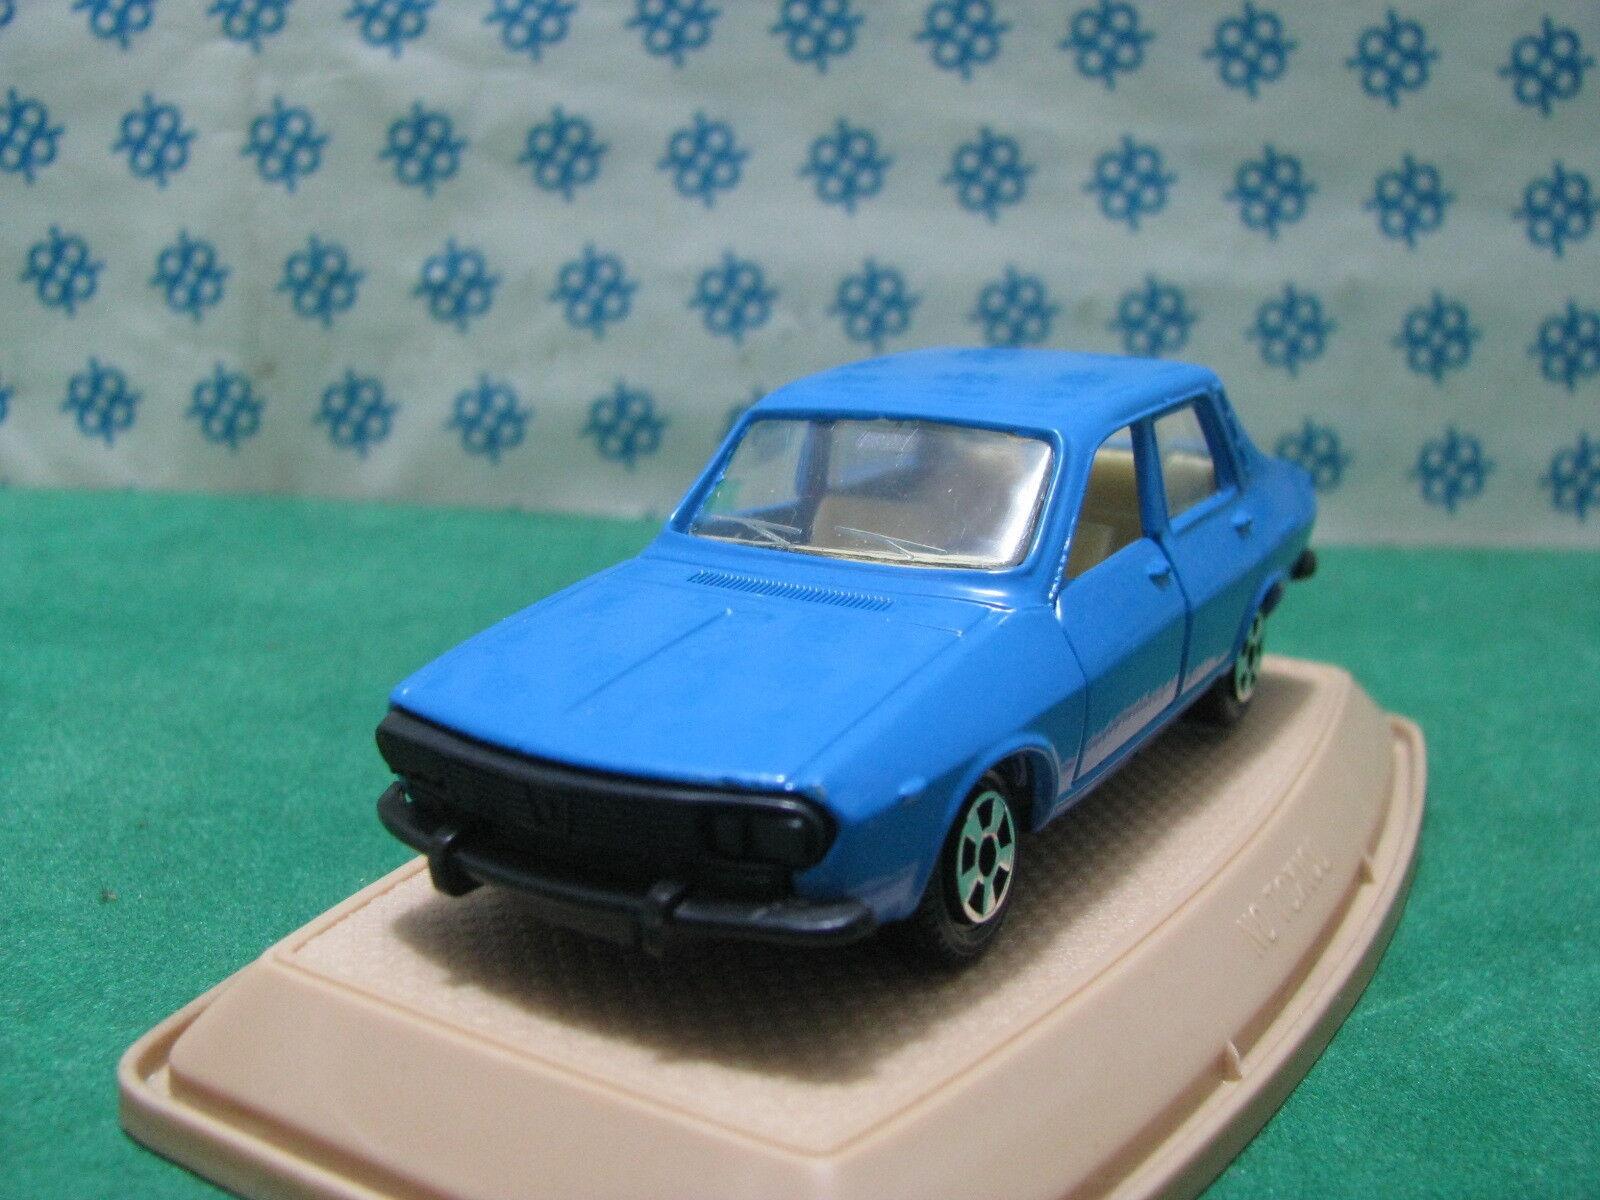 Vintage-Renault 12 s sedán - 1 43 Guiloy ref.155 Mint en Box